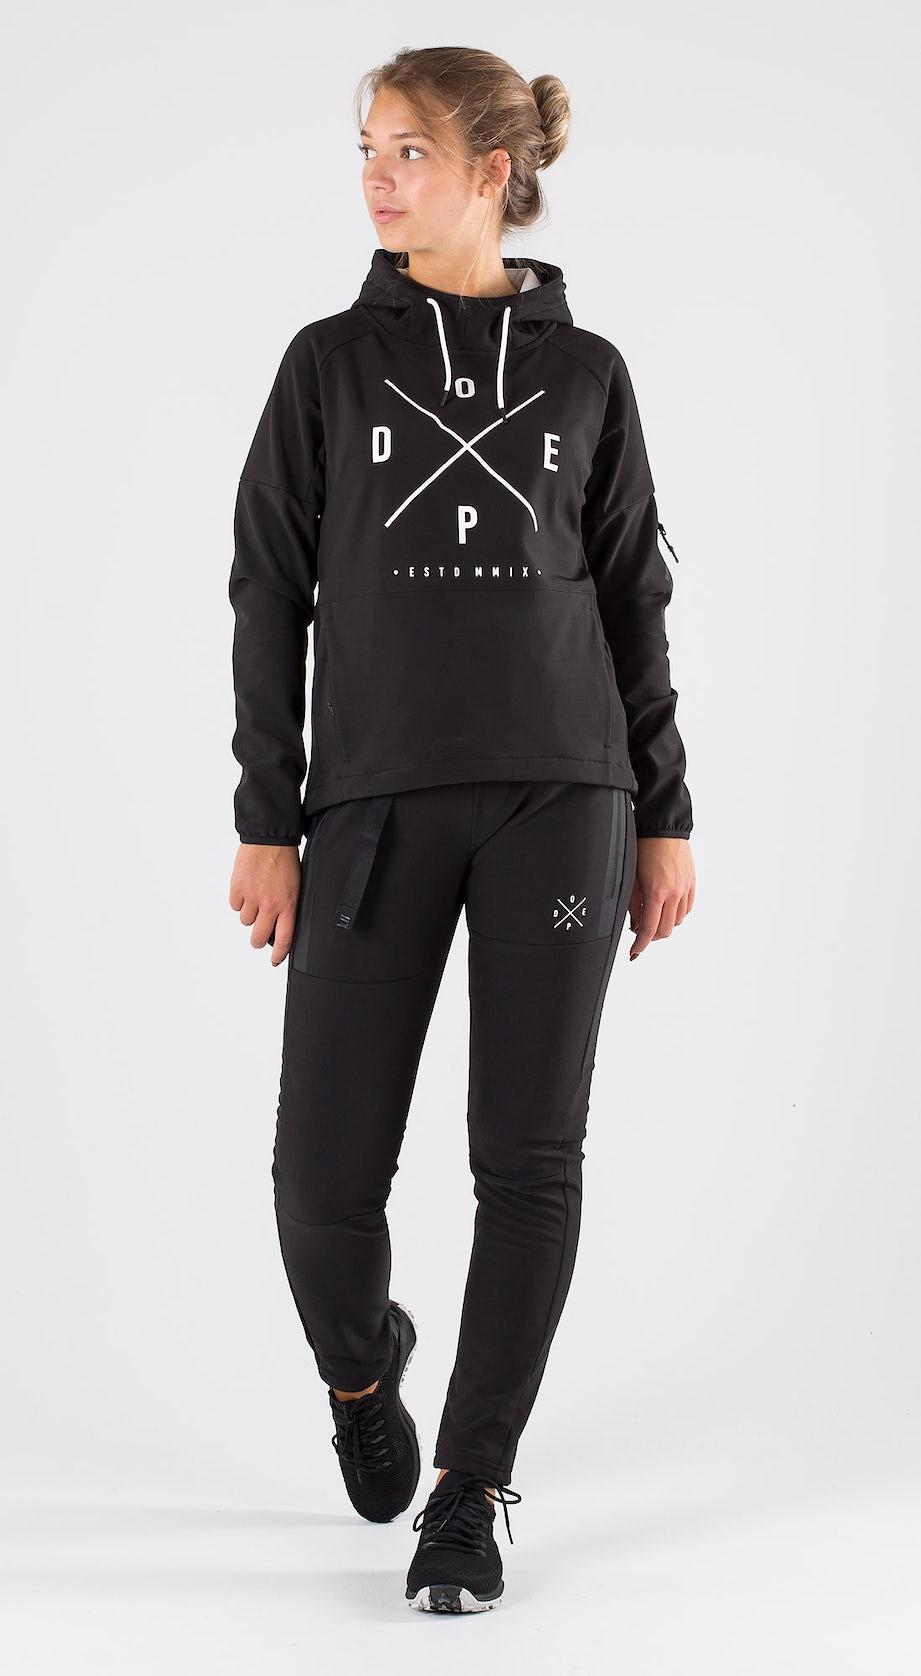 Dope Rambler Black Outfit Multi